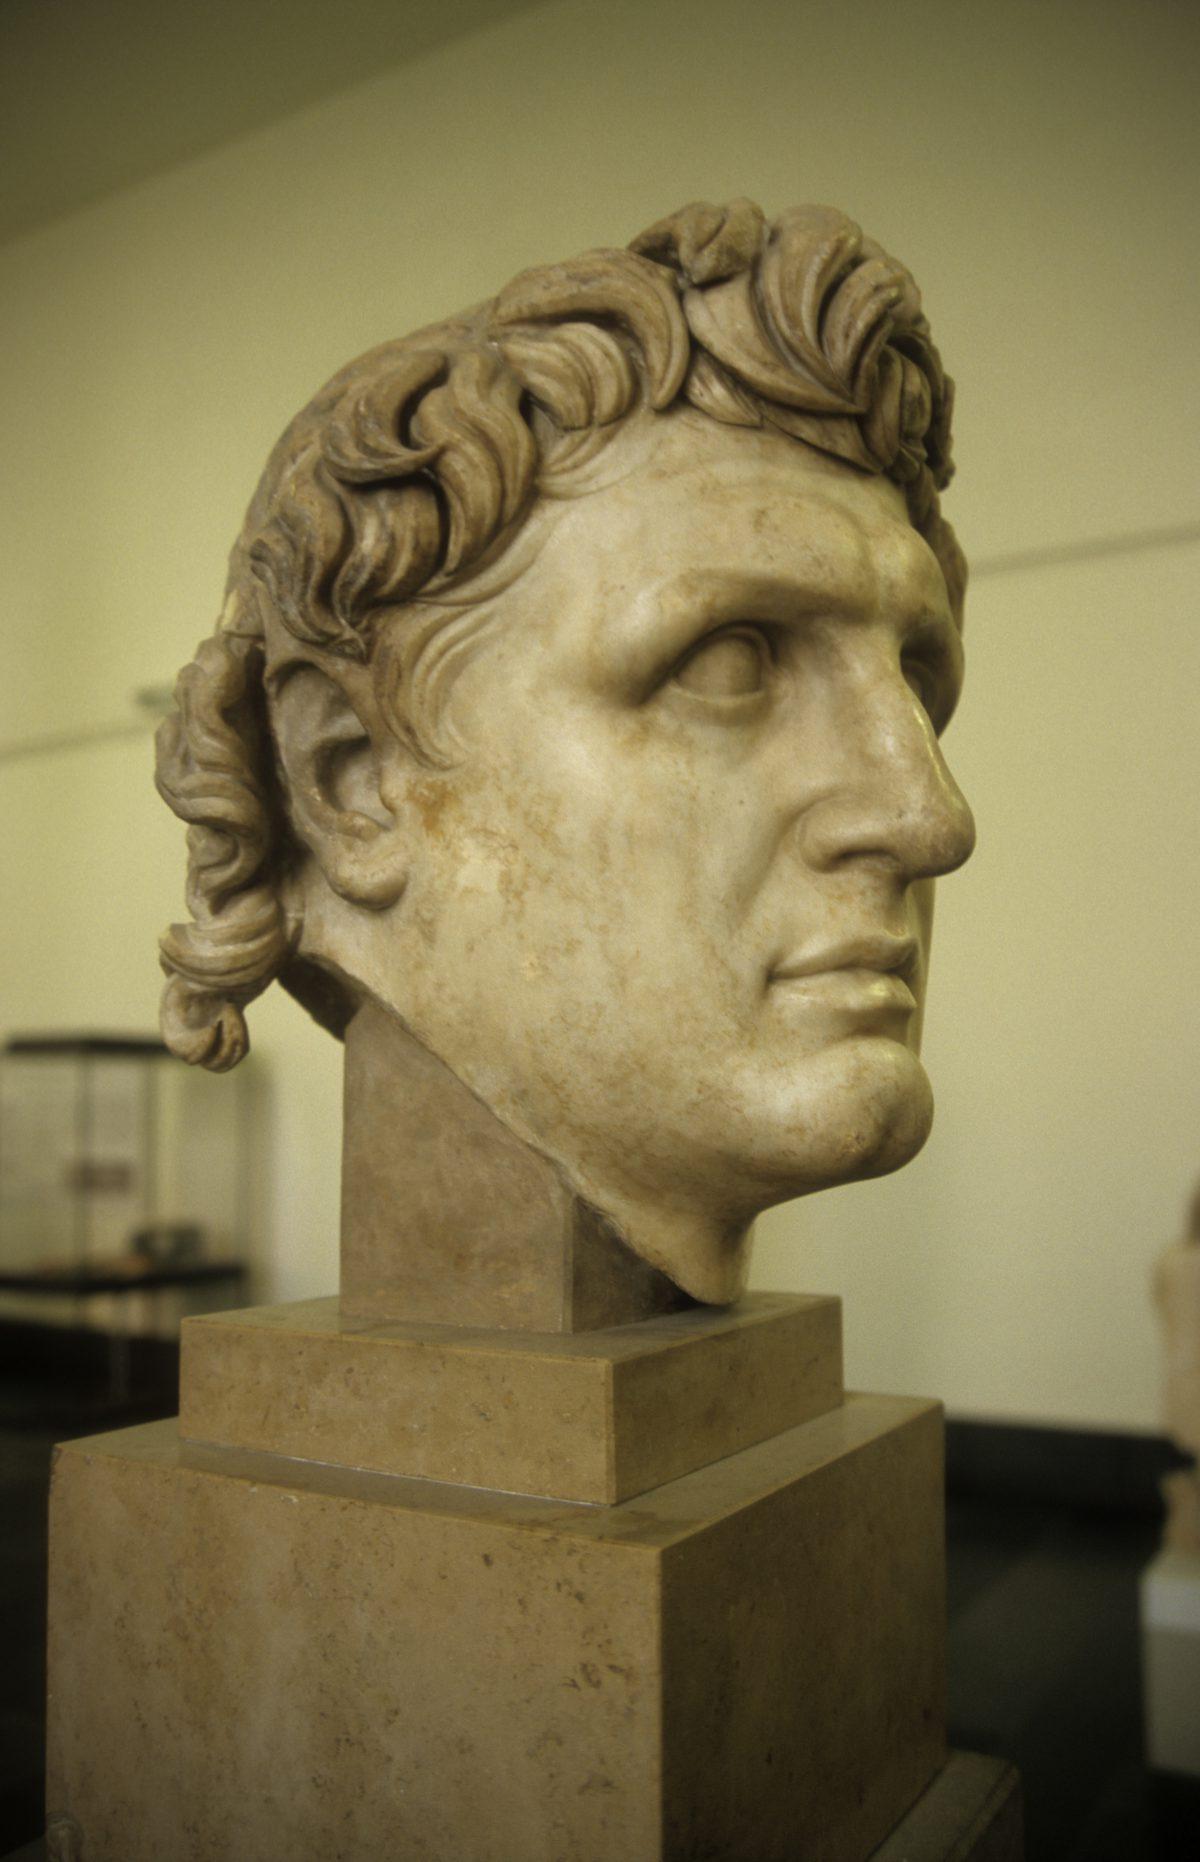 Roman bust - At the Pergamon museum, face, art, museum, sculpture, bust